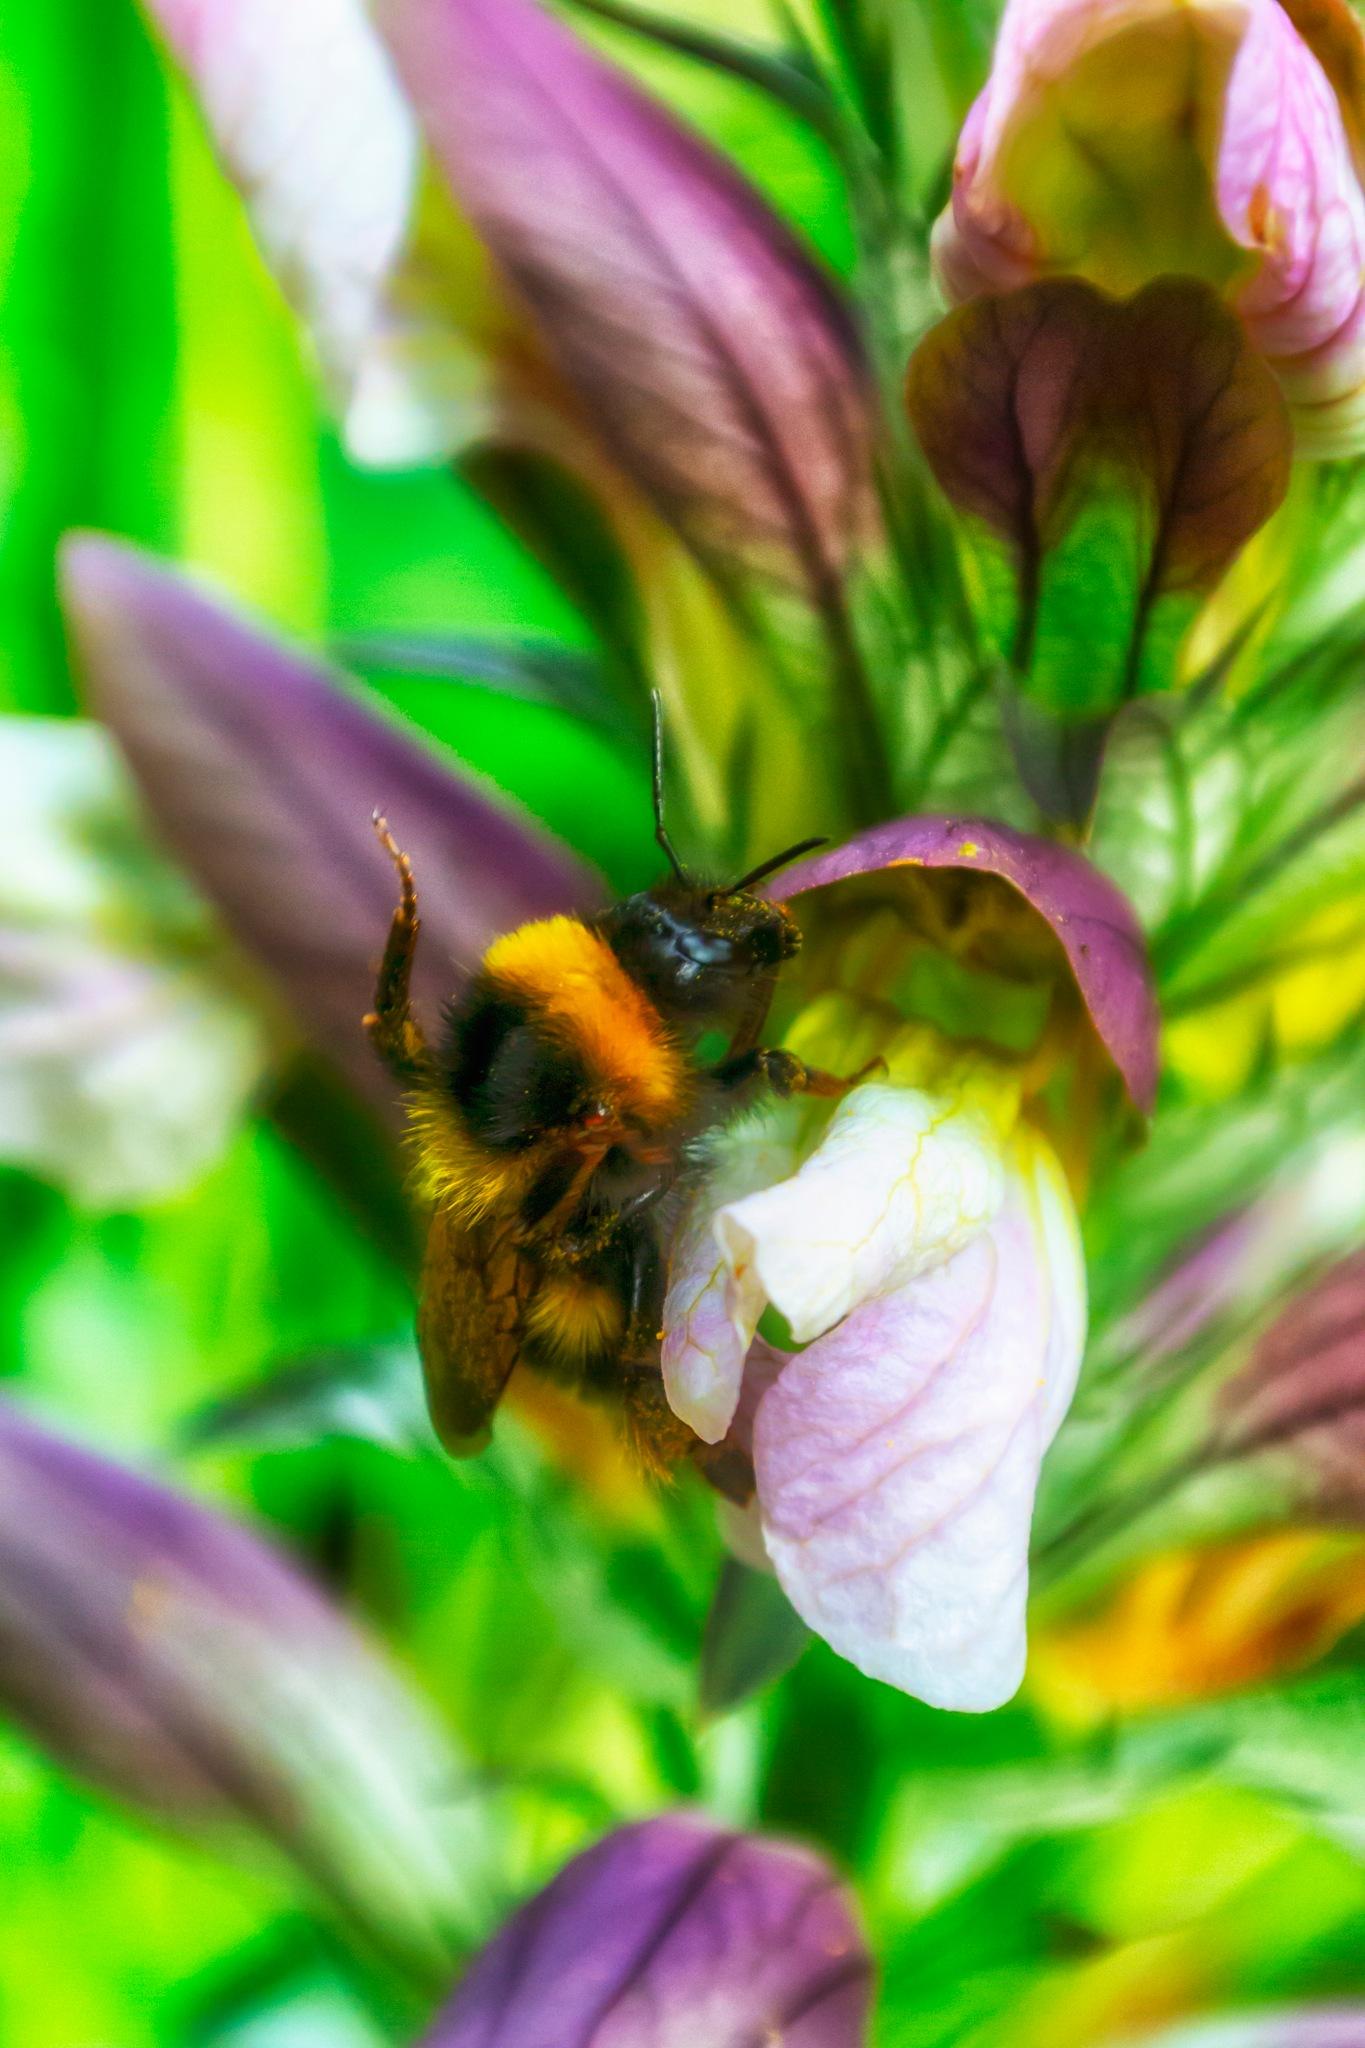 Acanthus and Bumblebee II by carljan w carlsson